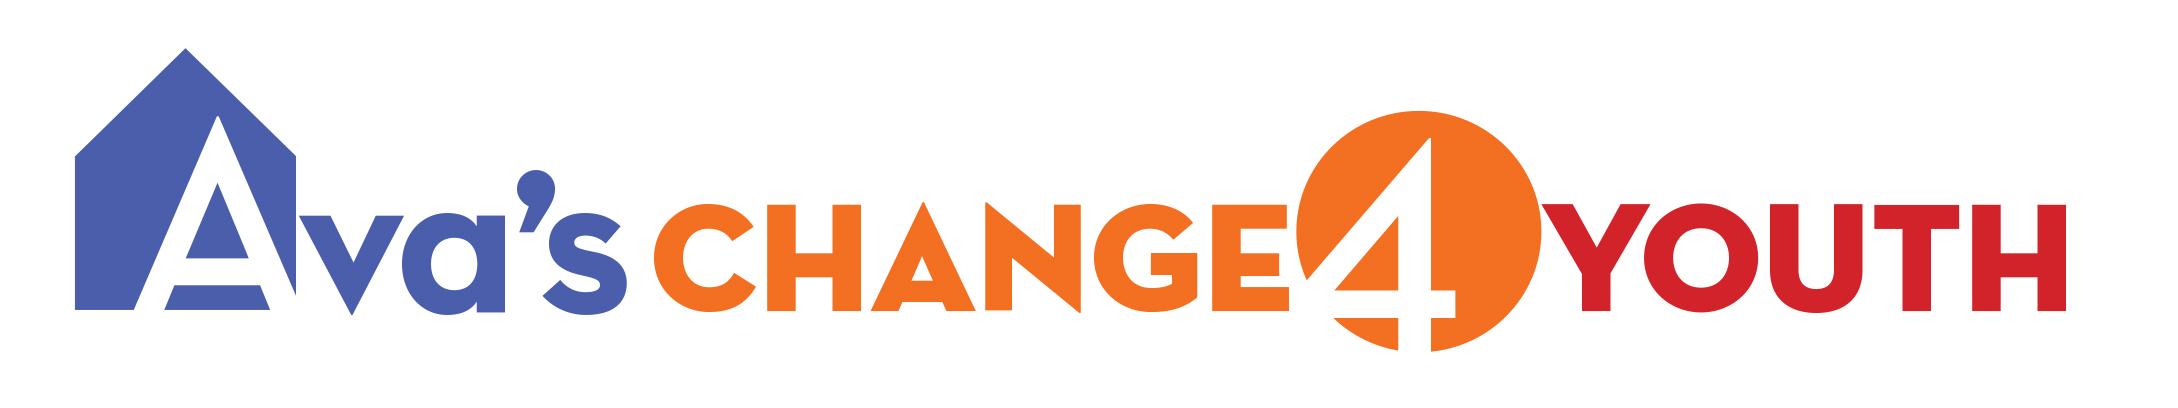 Ava's Change4Youth Logo